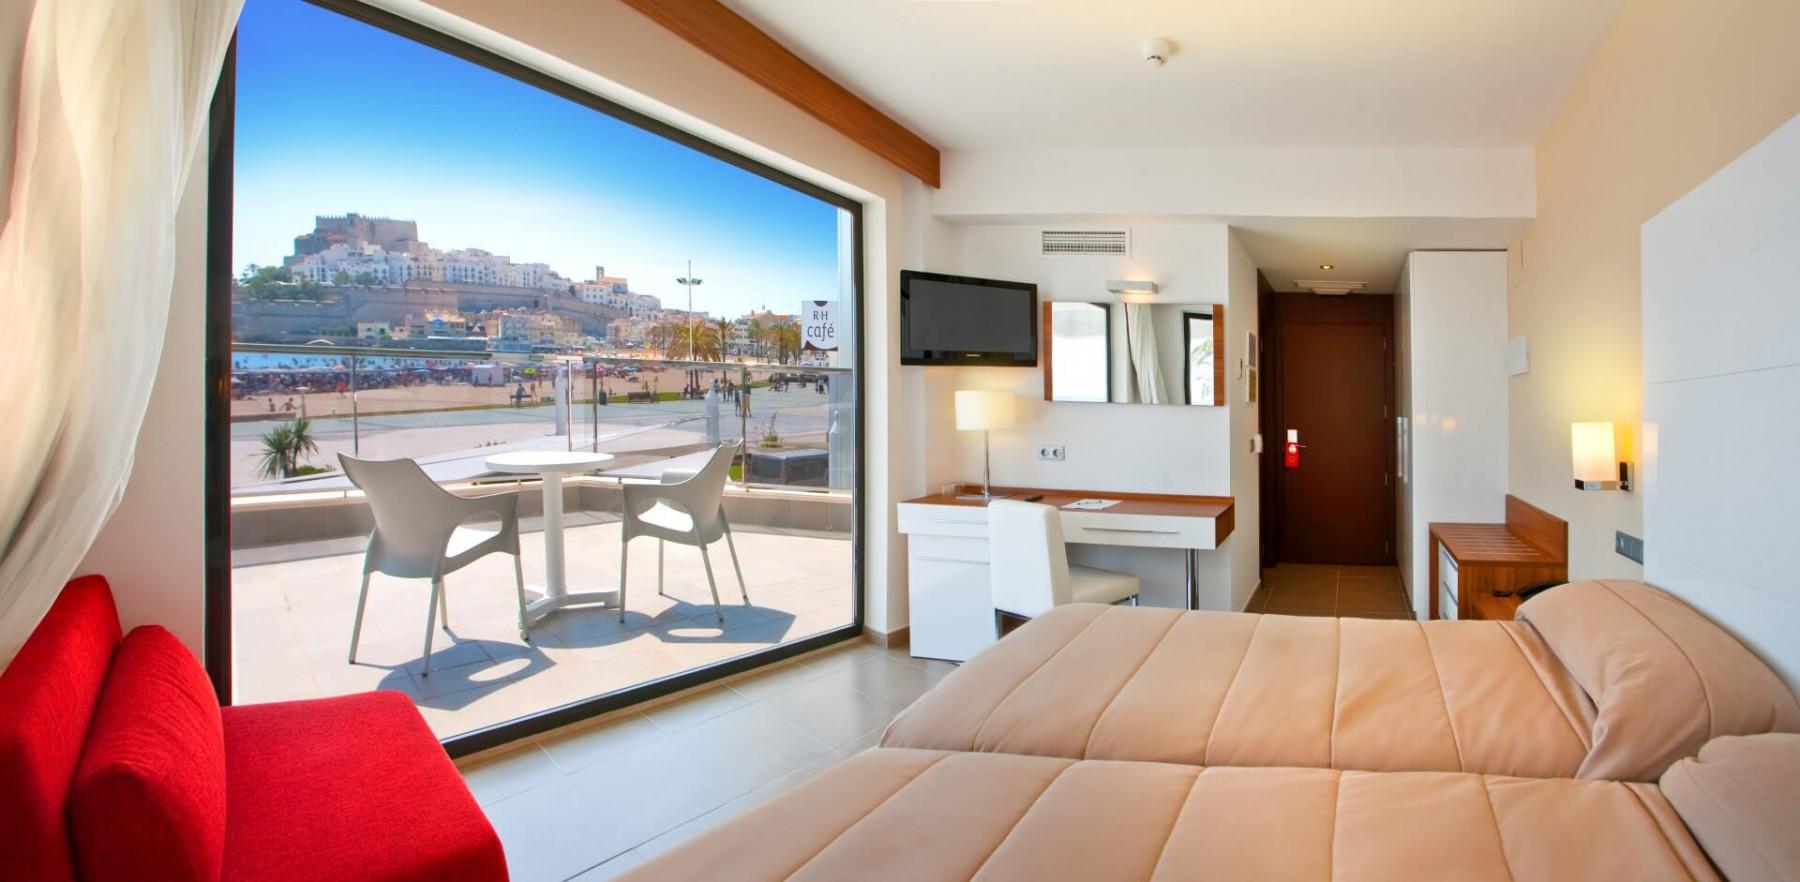 hoteles baratos san valentin Peñíscola